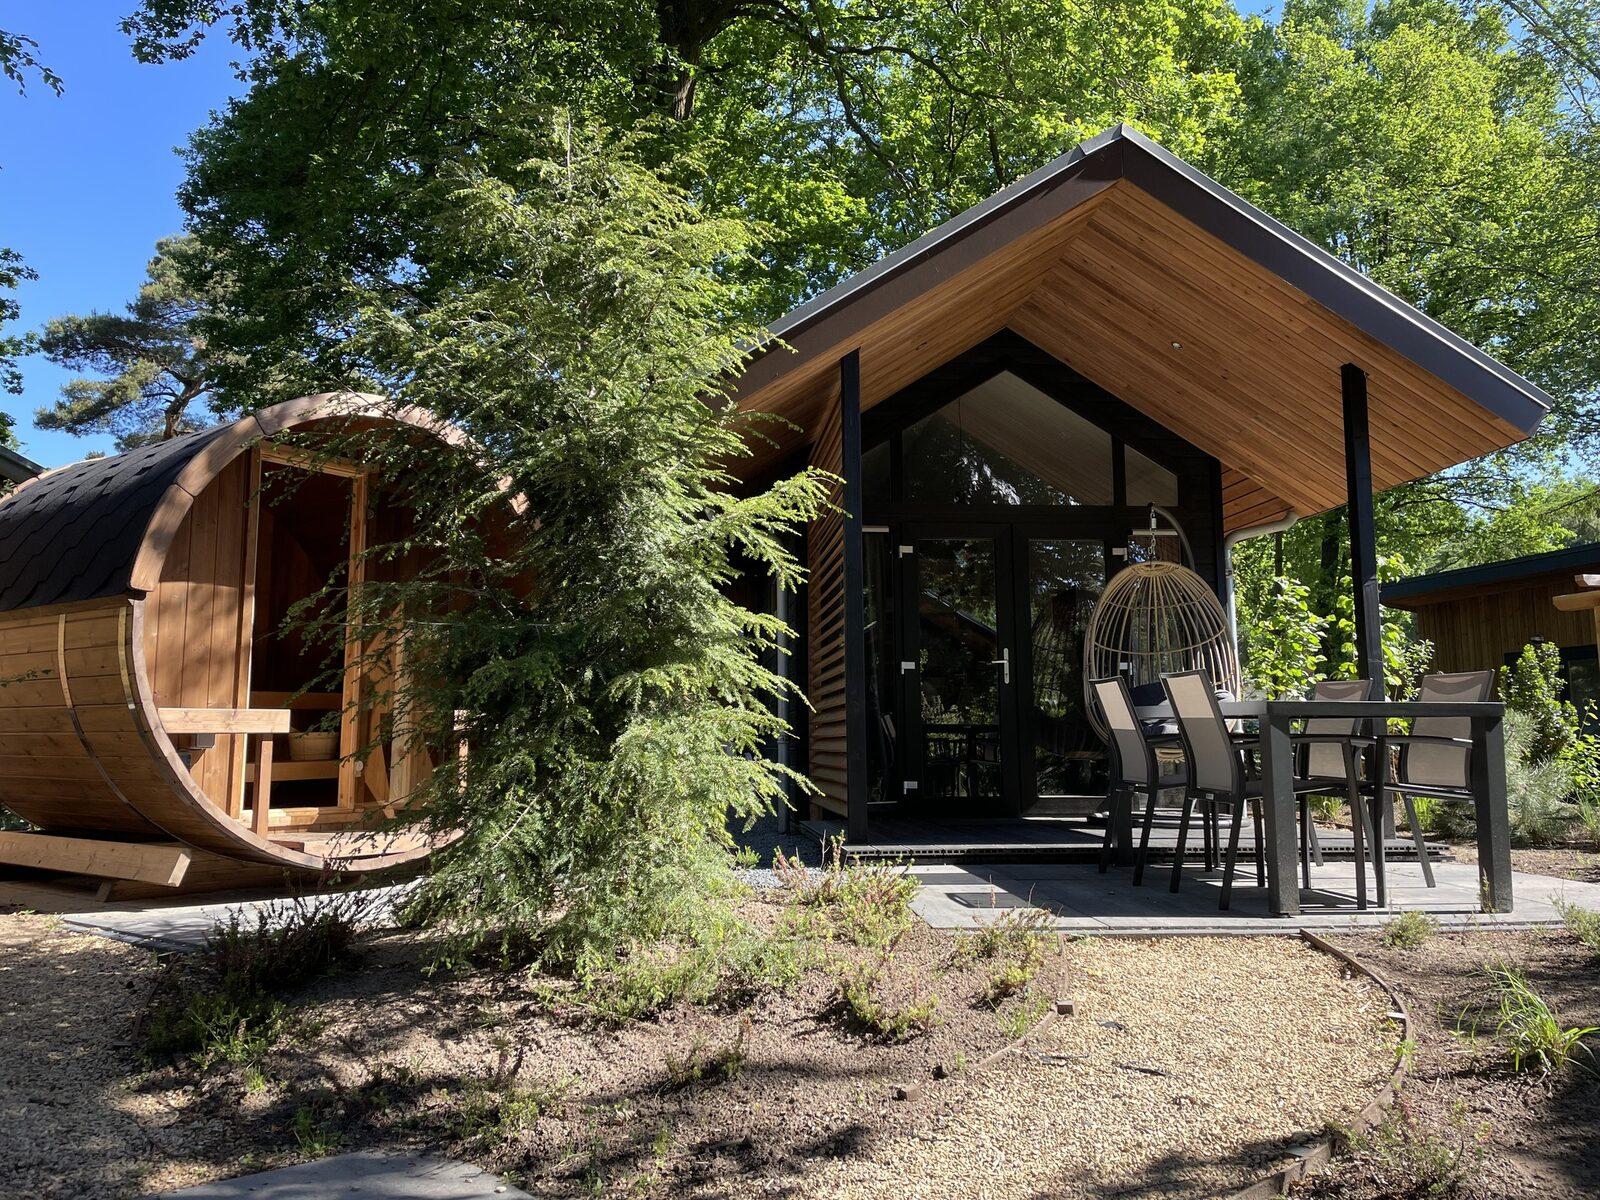 Tiny Lodge Eco 4 Personen (Sauna)